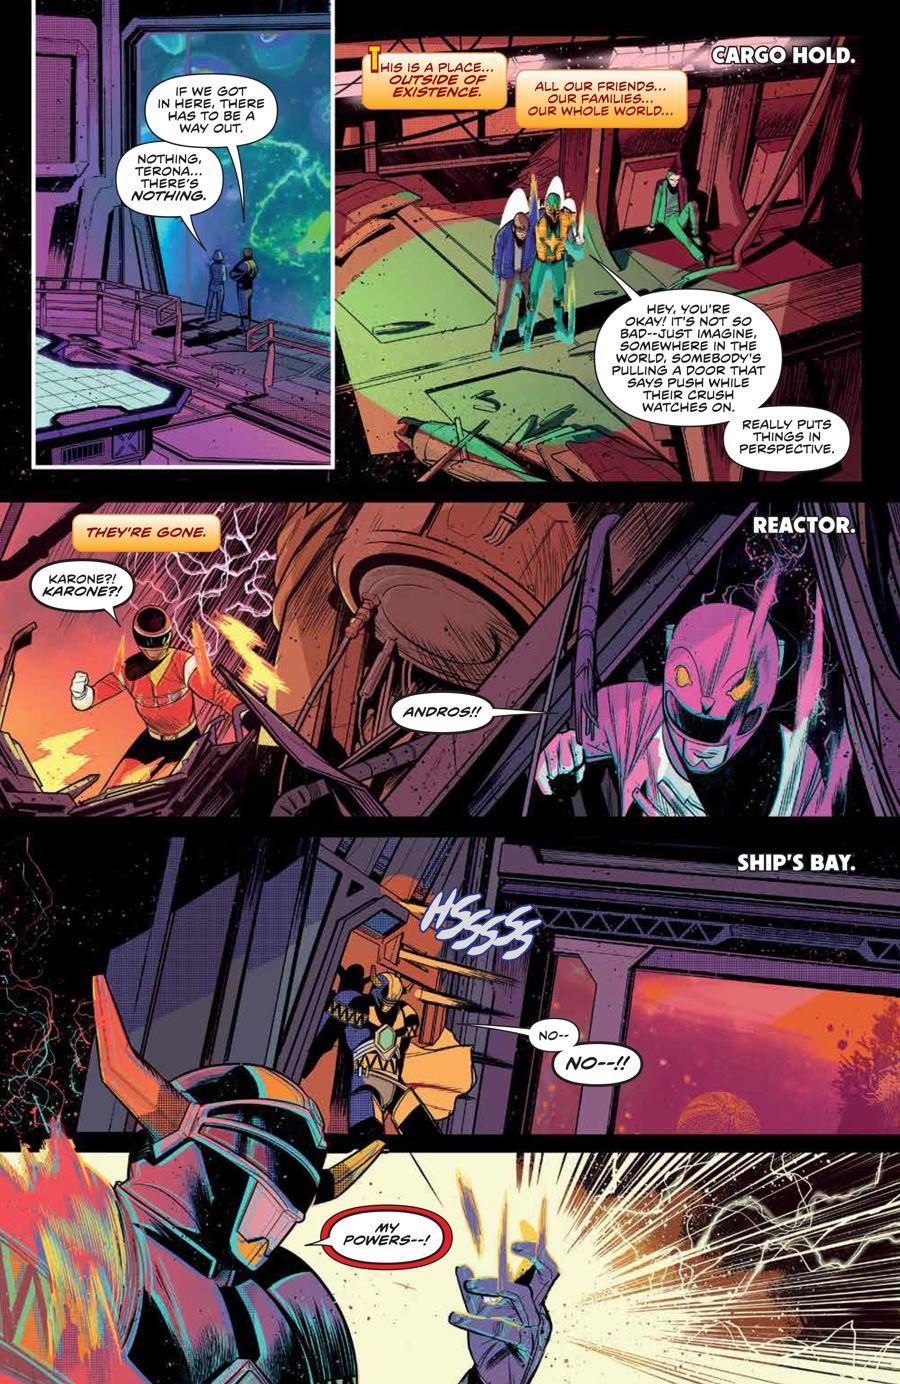 MMPR_BeyondGrid_SC_PRESS_15 ComicList Previews: MIGHTY MORPHIN POWER RANGERS BEYOND THE GRID TP